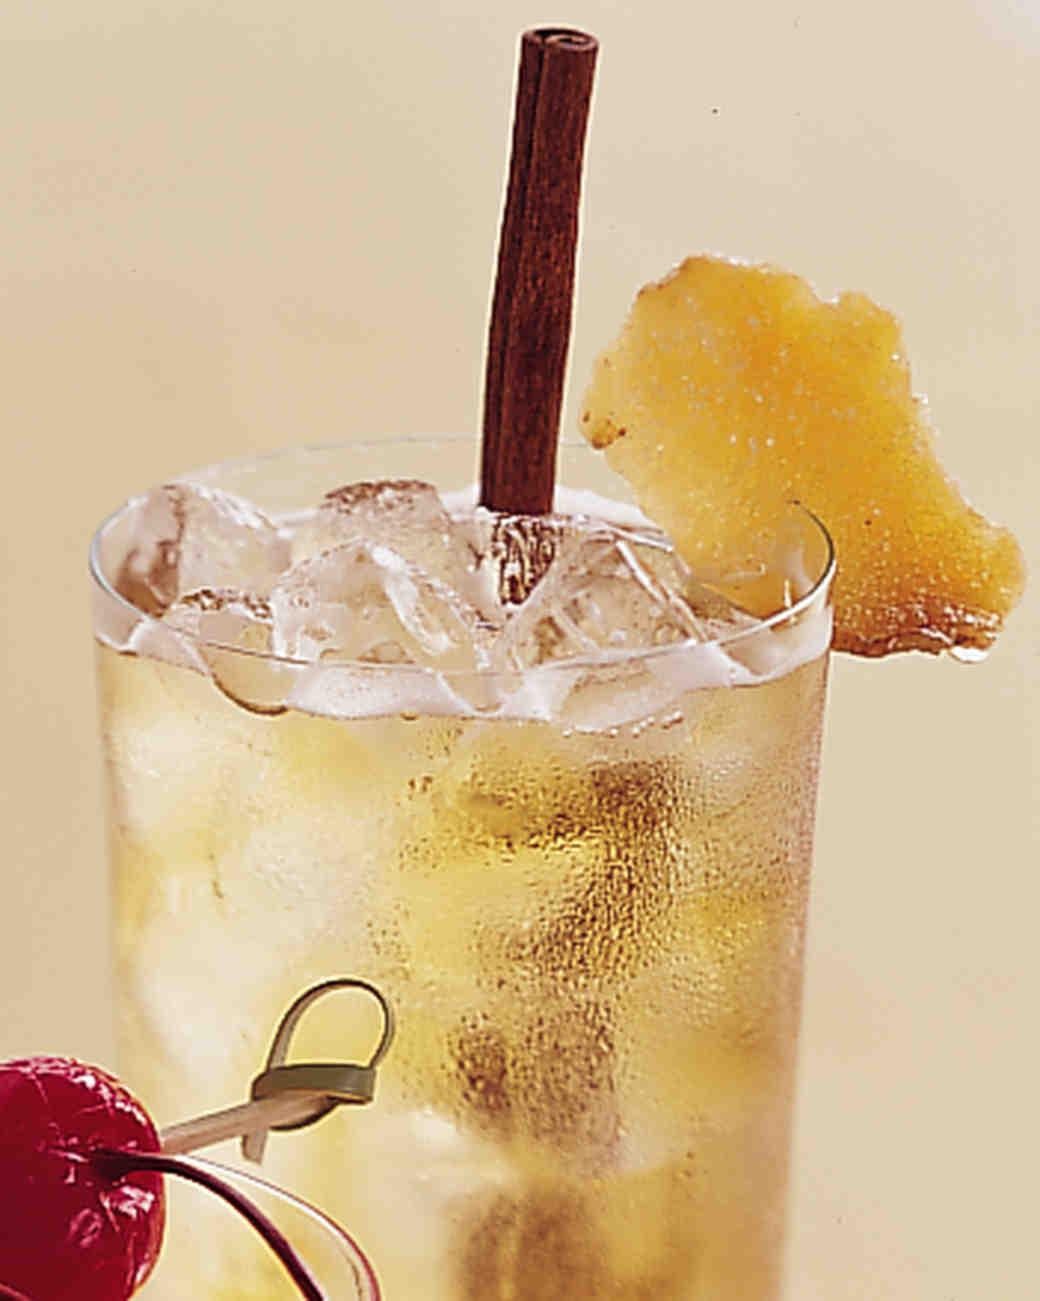 wedding-mocktail-recipes-nonalcoholic-drinks-apple-ginger-sparklers-0915.jpg